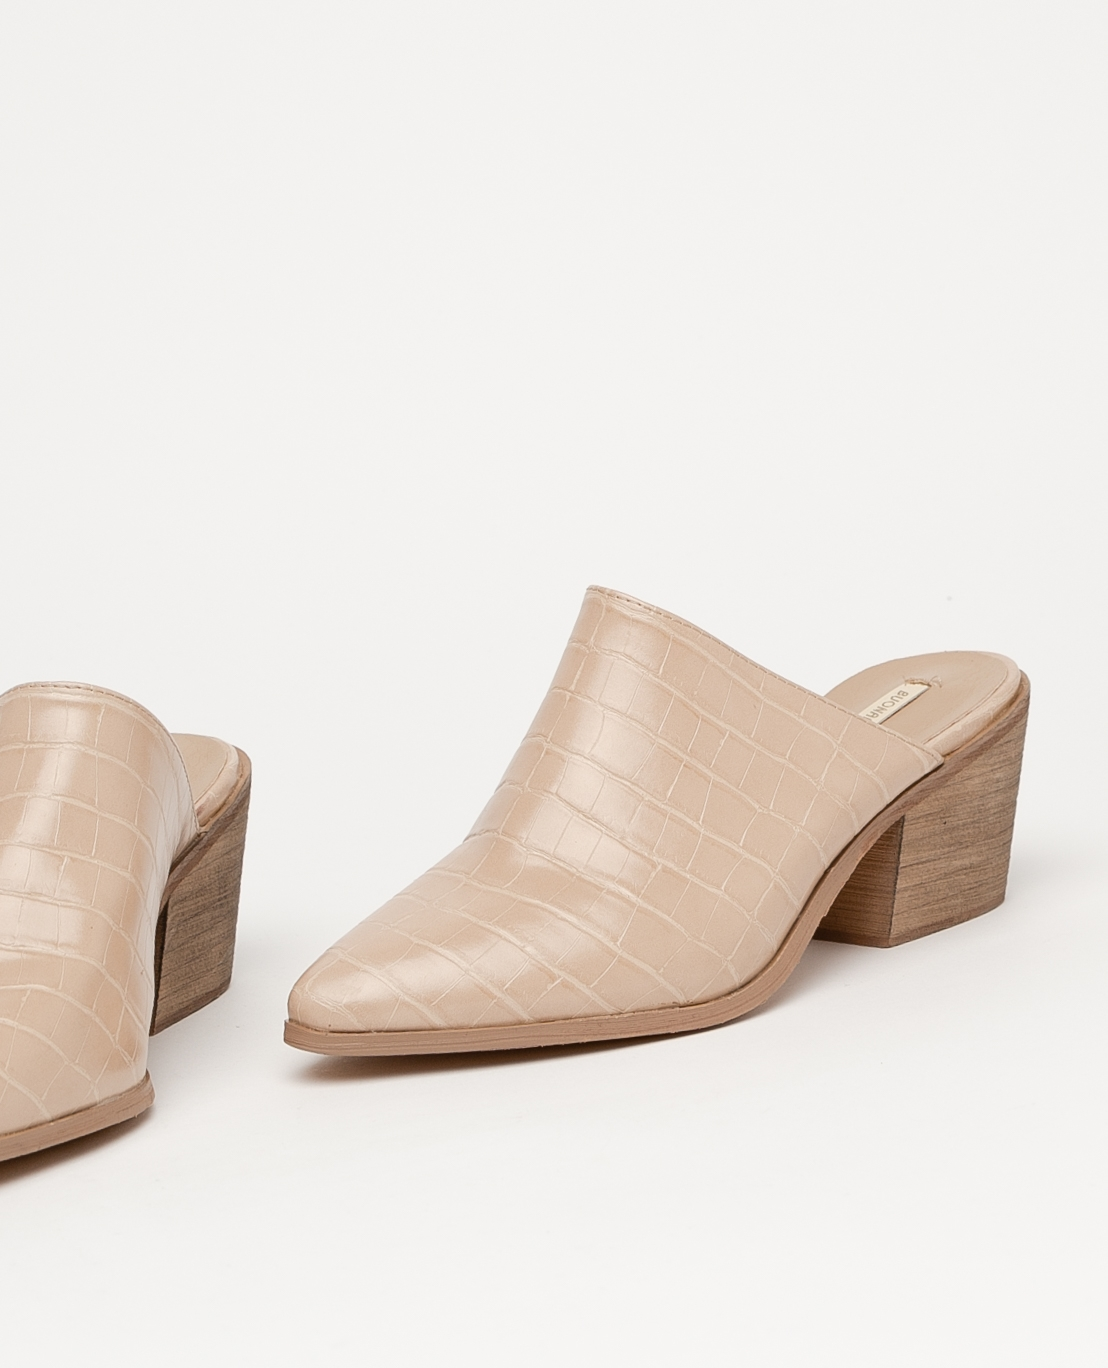 Sandalia de tacón Namur - Beige